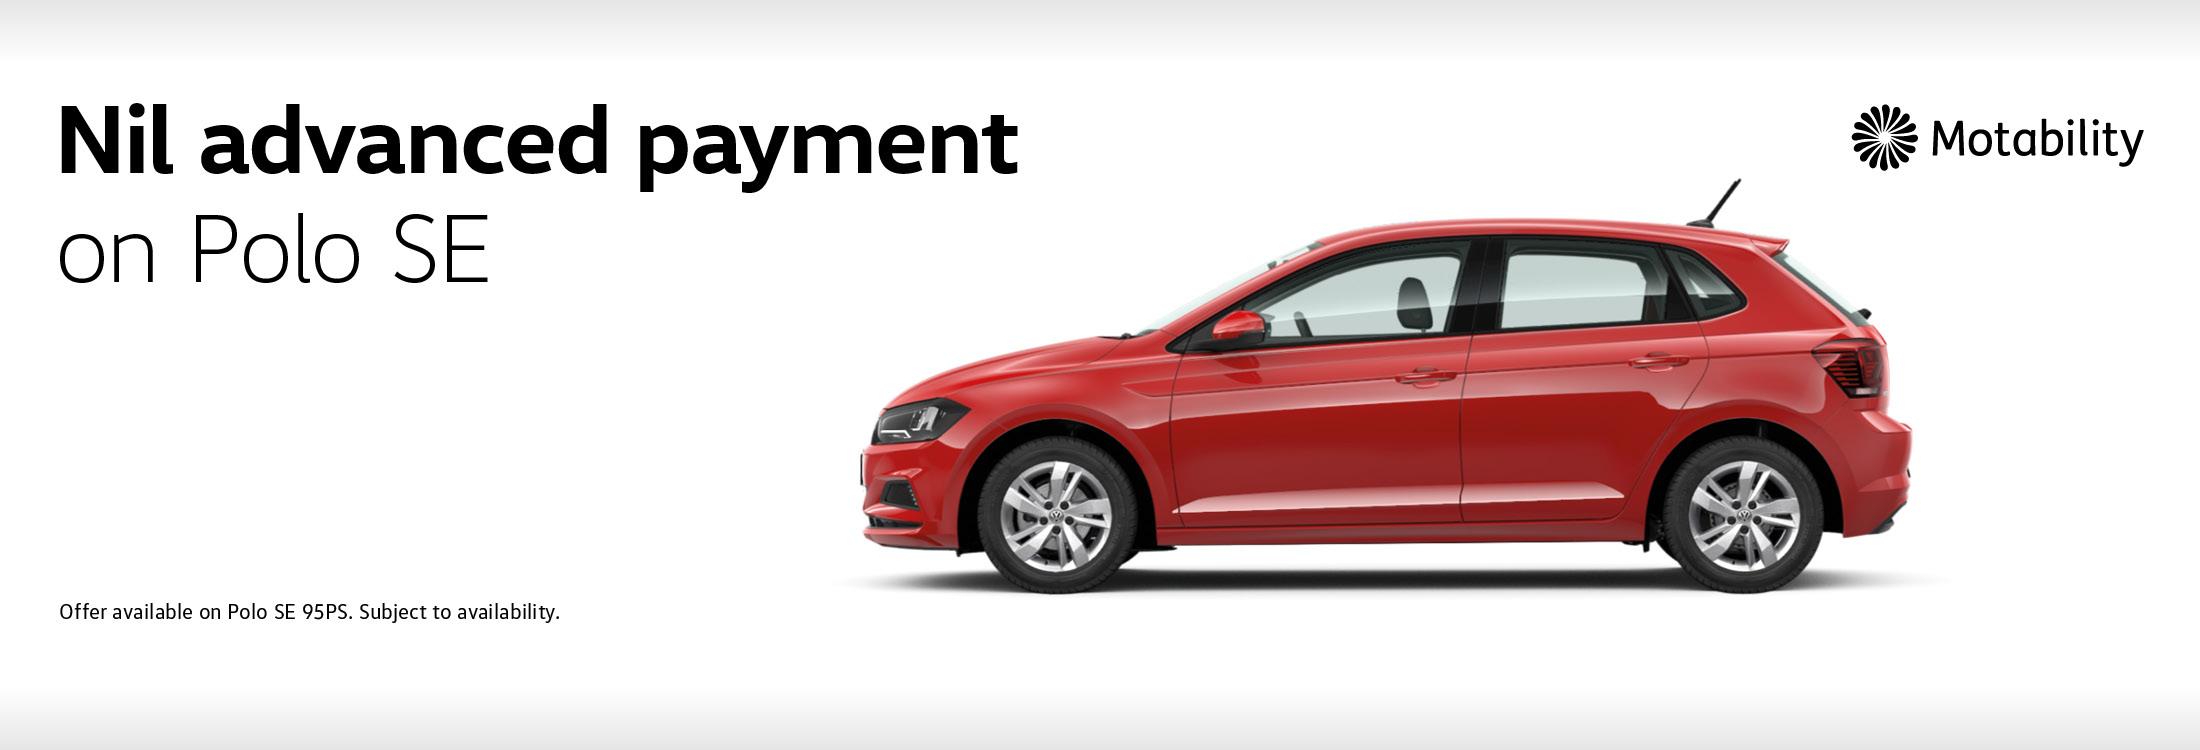 polo se nil advance payment